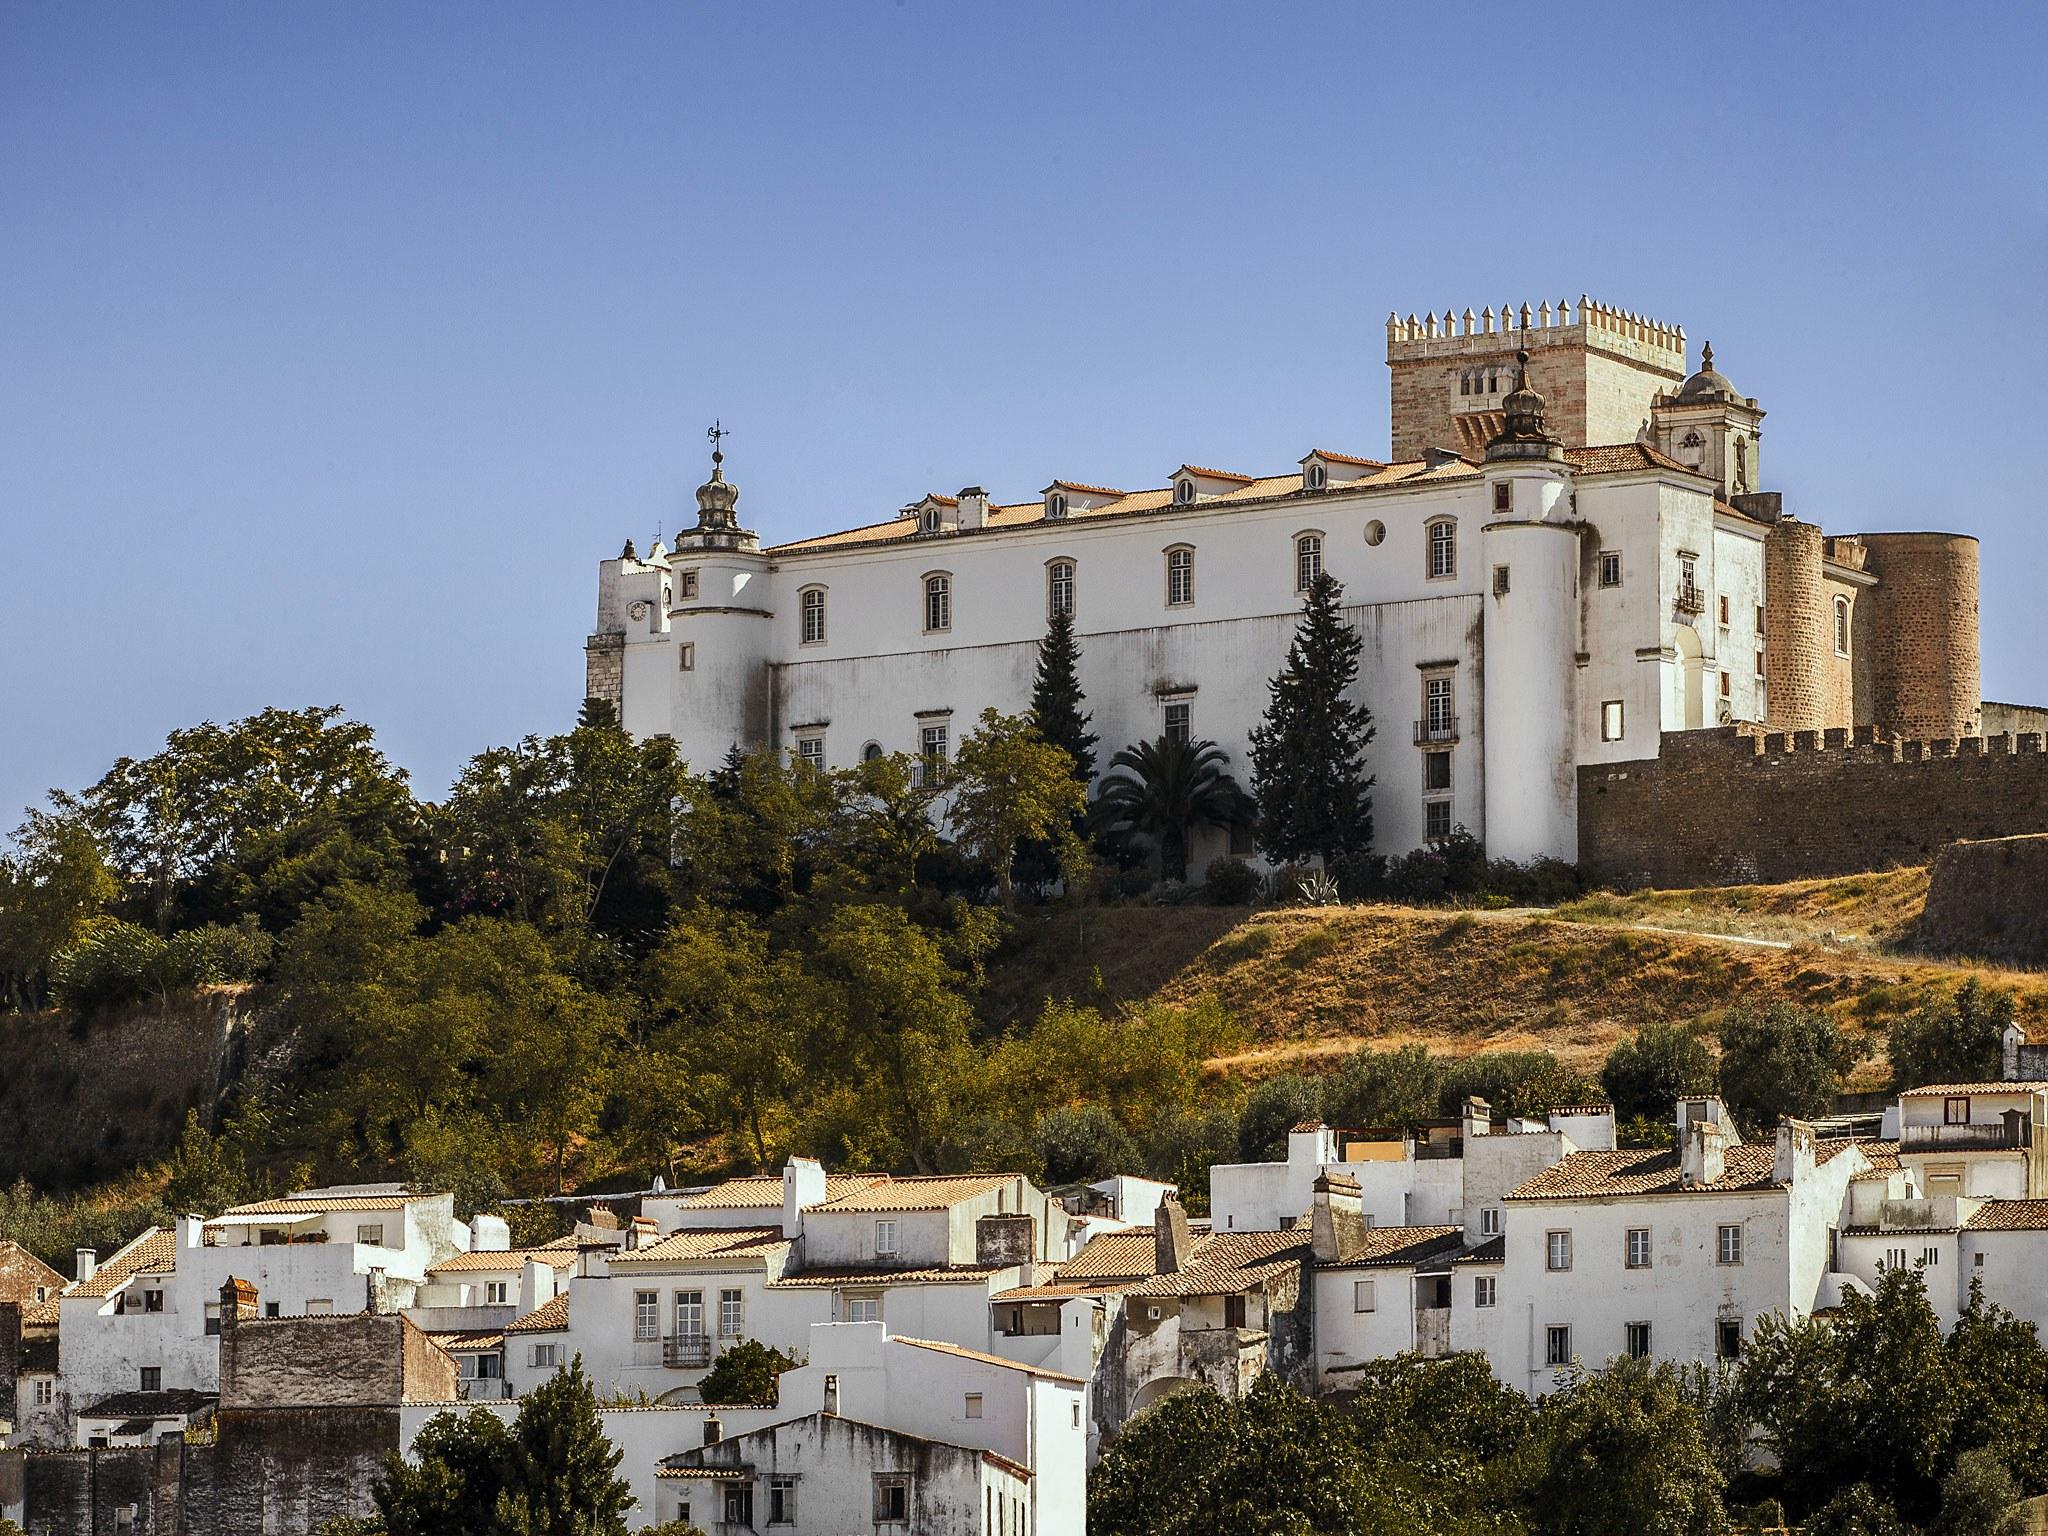 estremoz-castle-alentejo-portugal.jpg